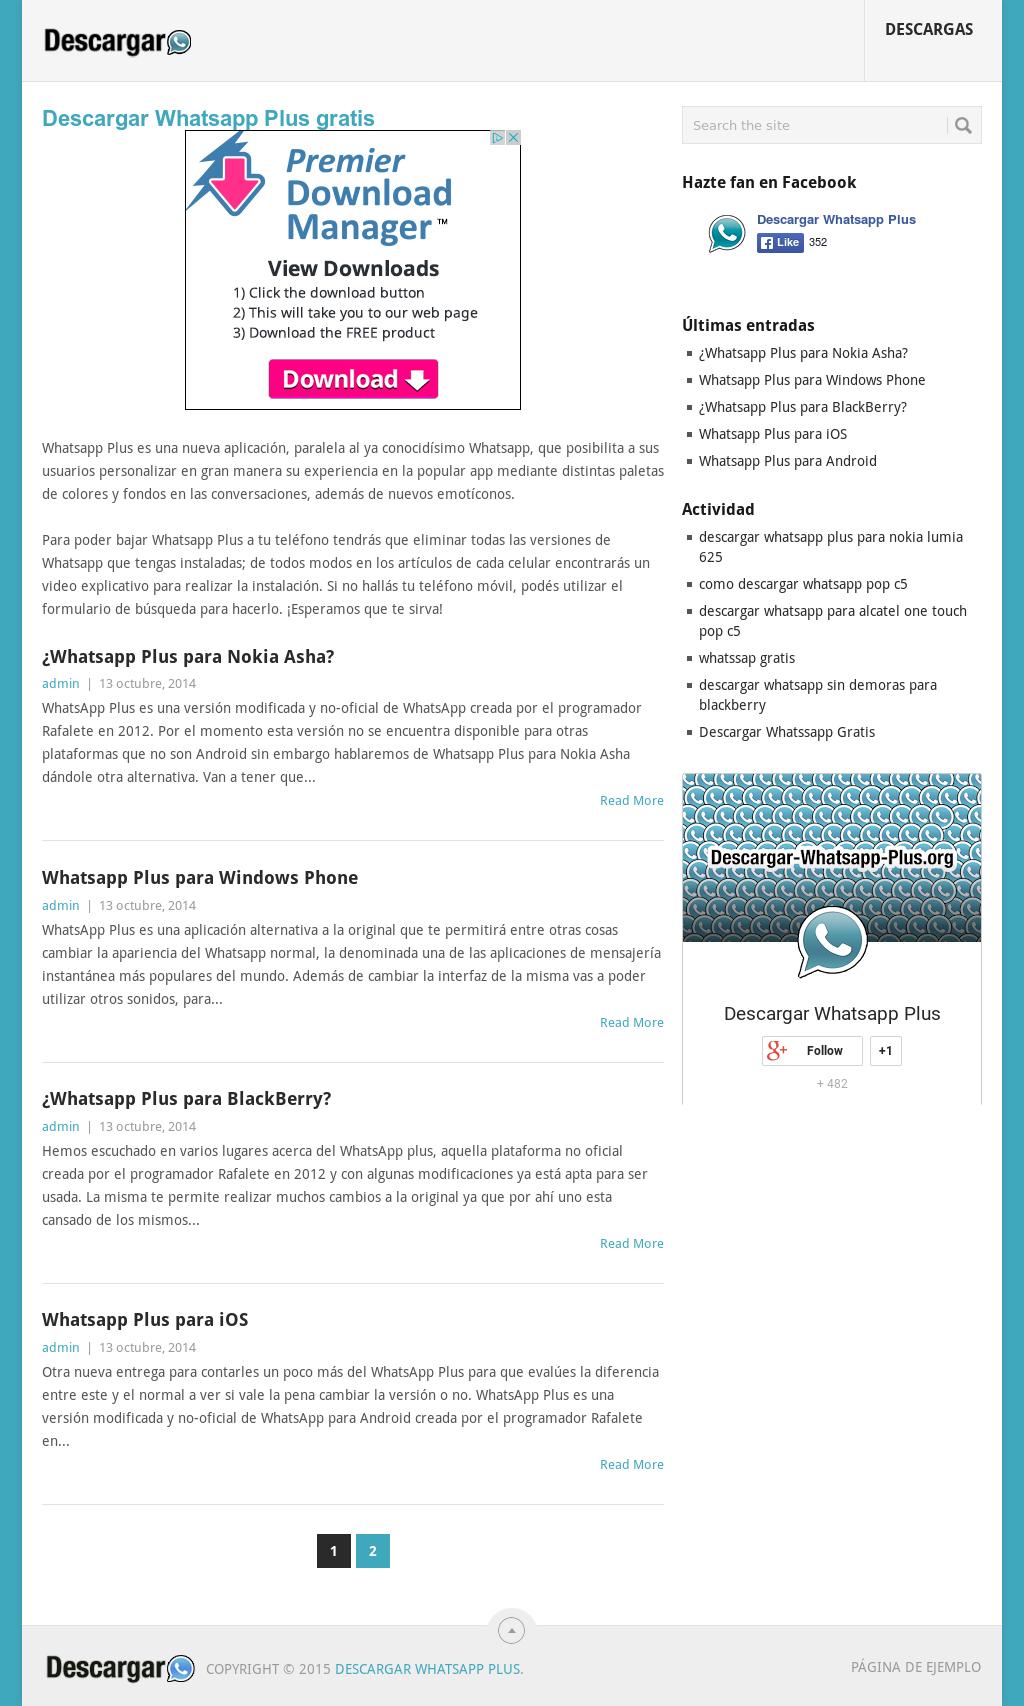 whatsapp web plus descargar gratis